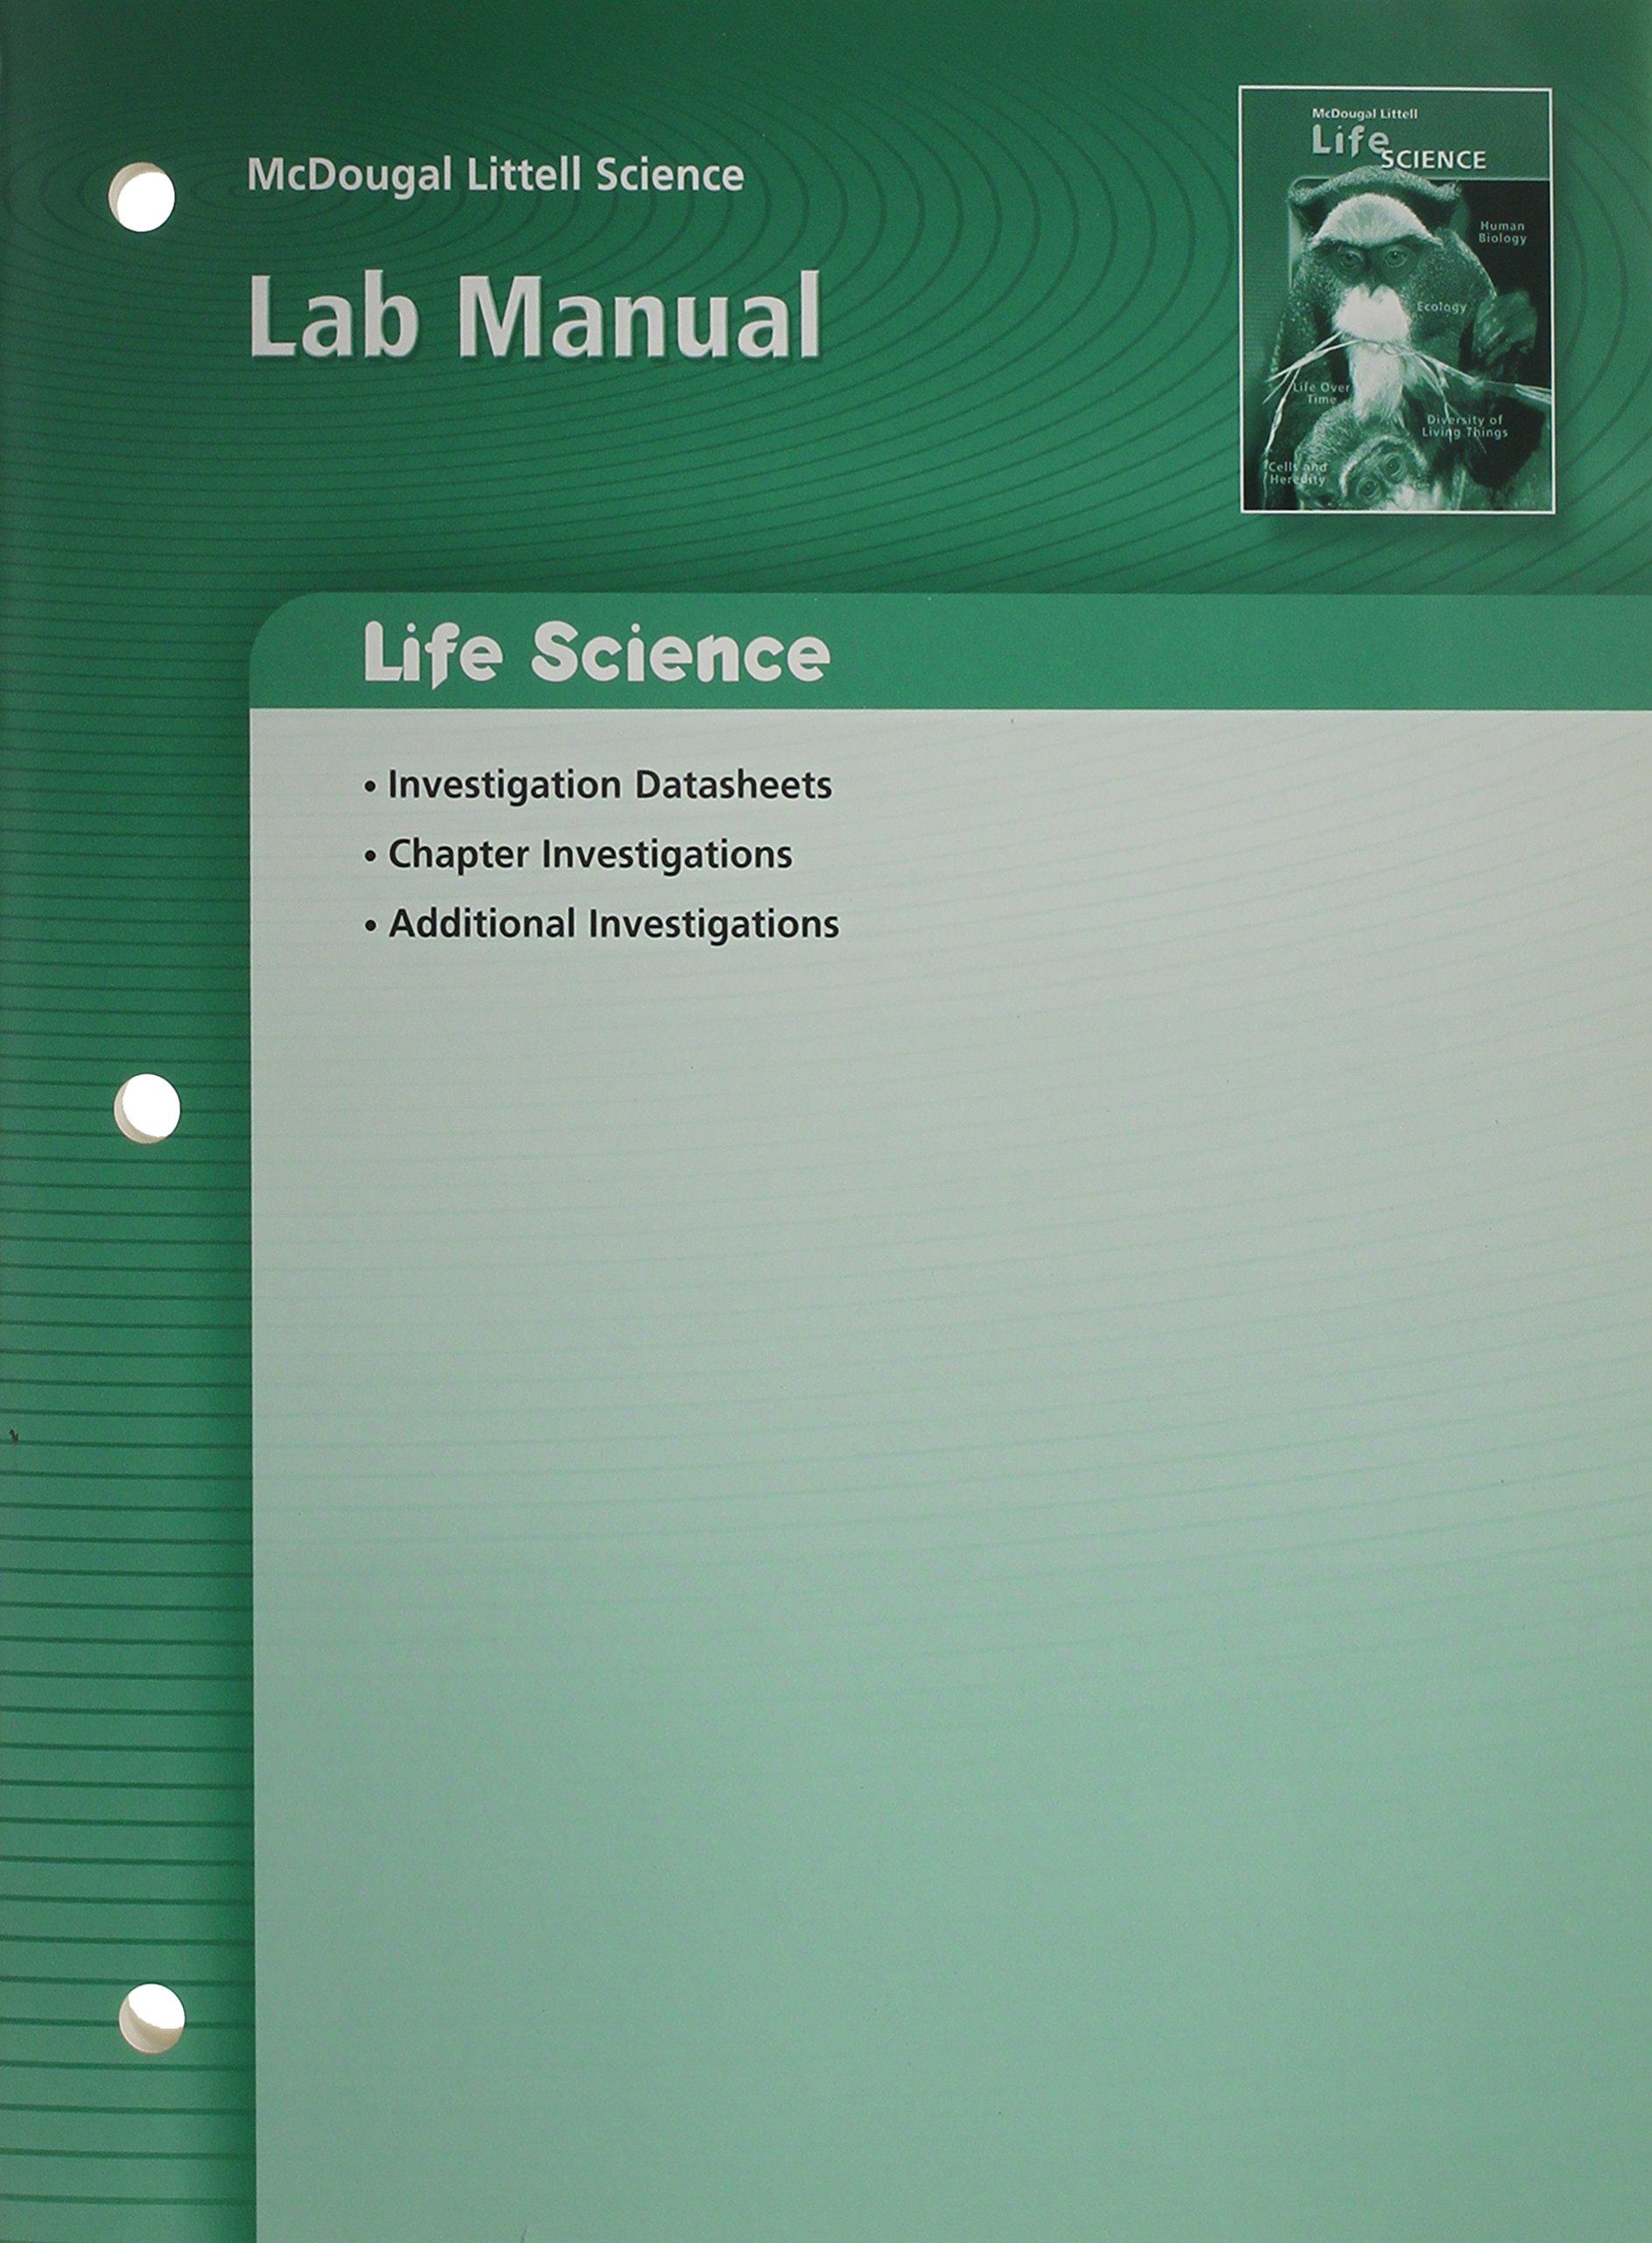 McDougal Littell Science: Life Science: Lab Manual: MCDOUGAL LITTEL:  9780618615360: Amazon.com: Books